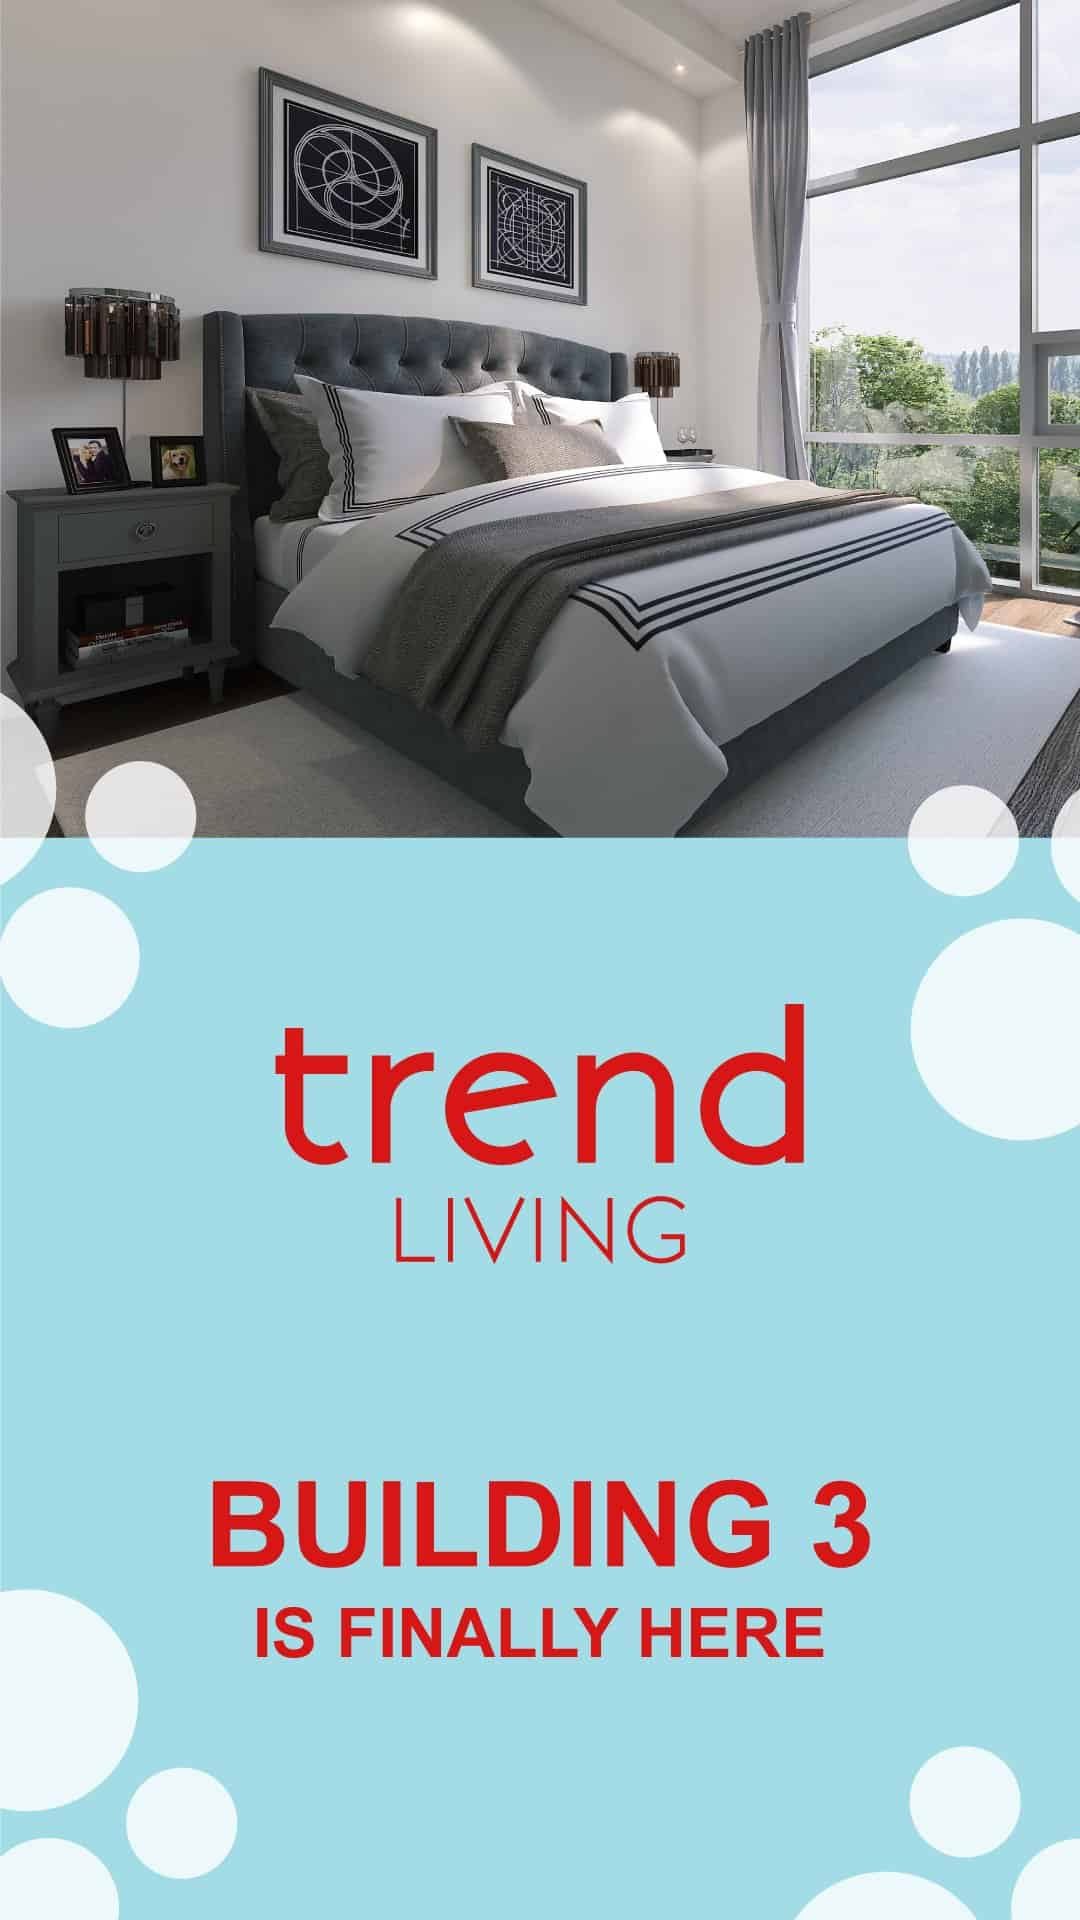 Trend Living